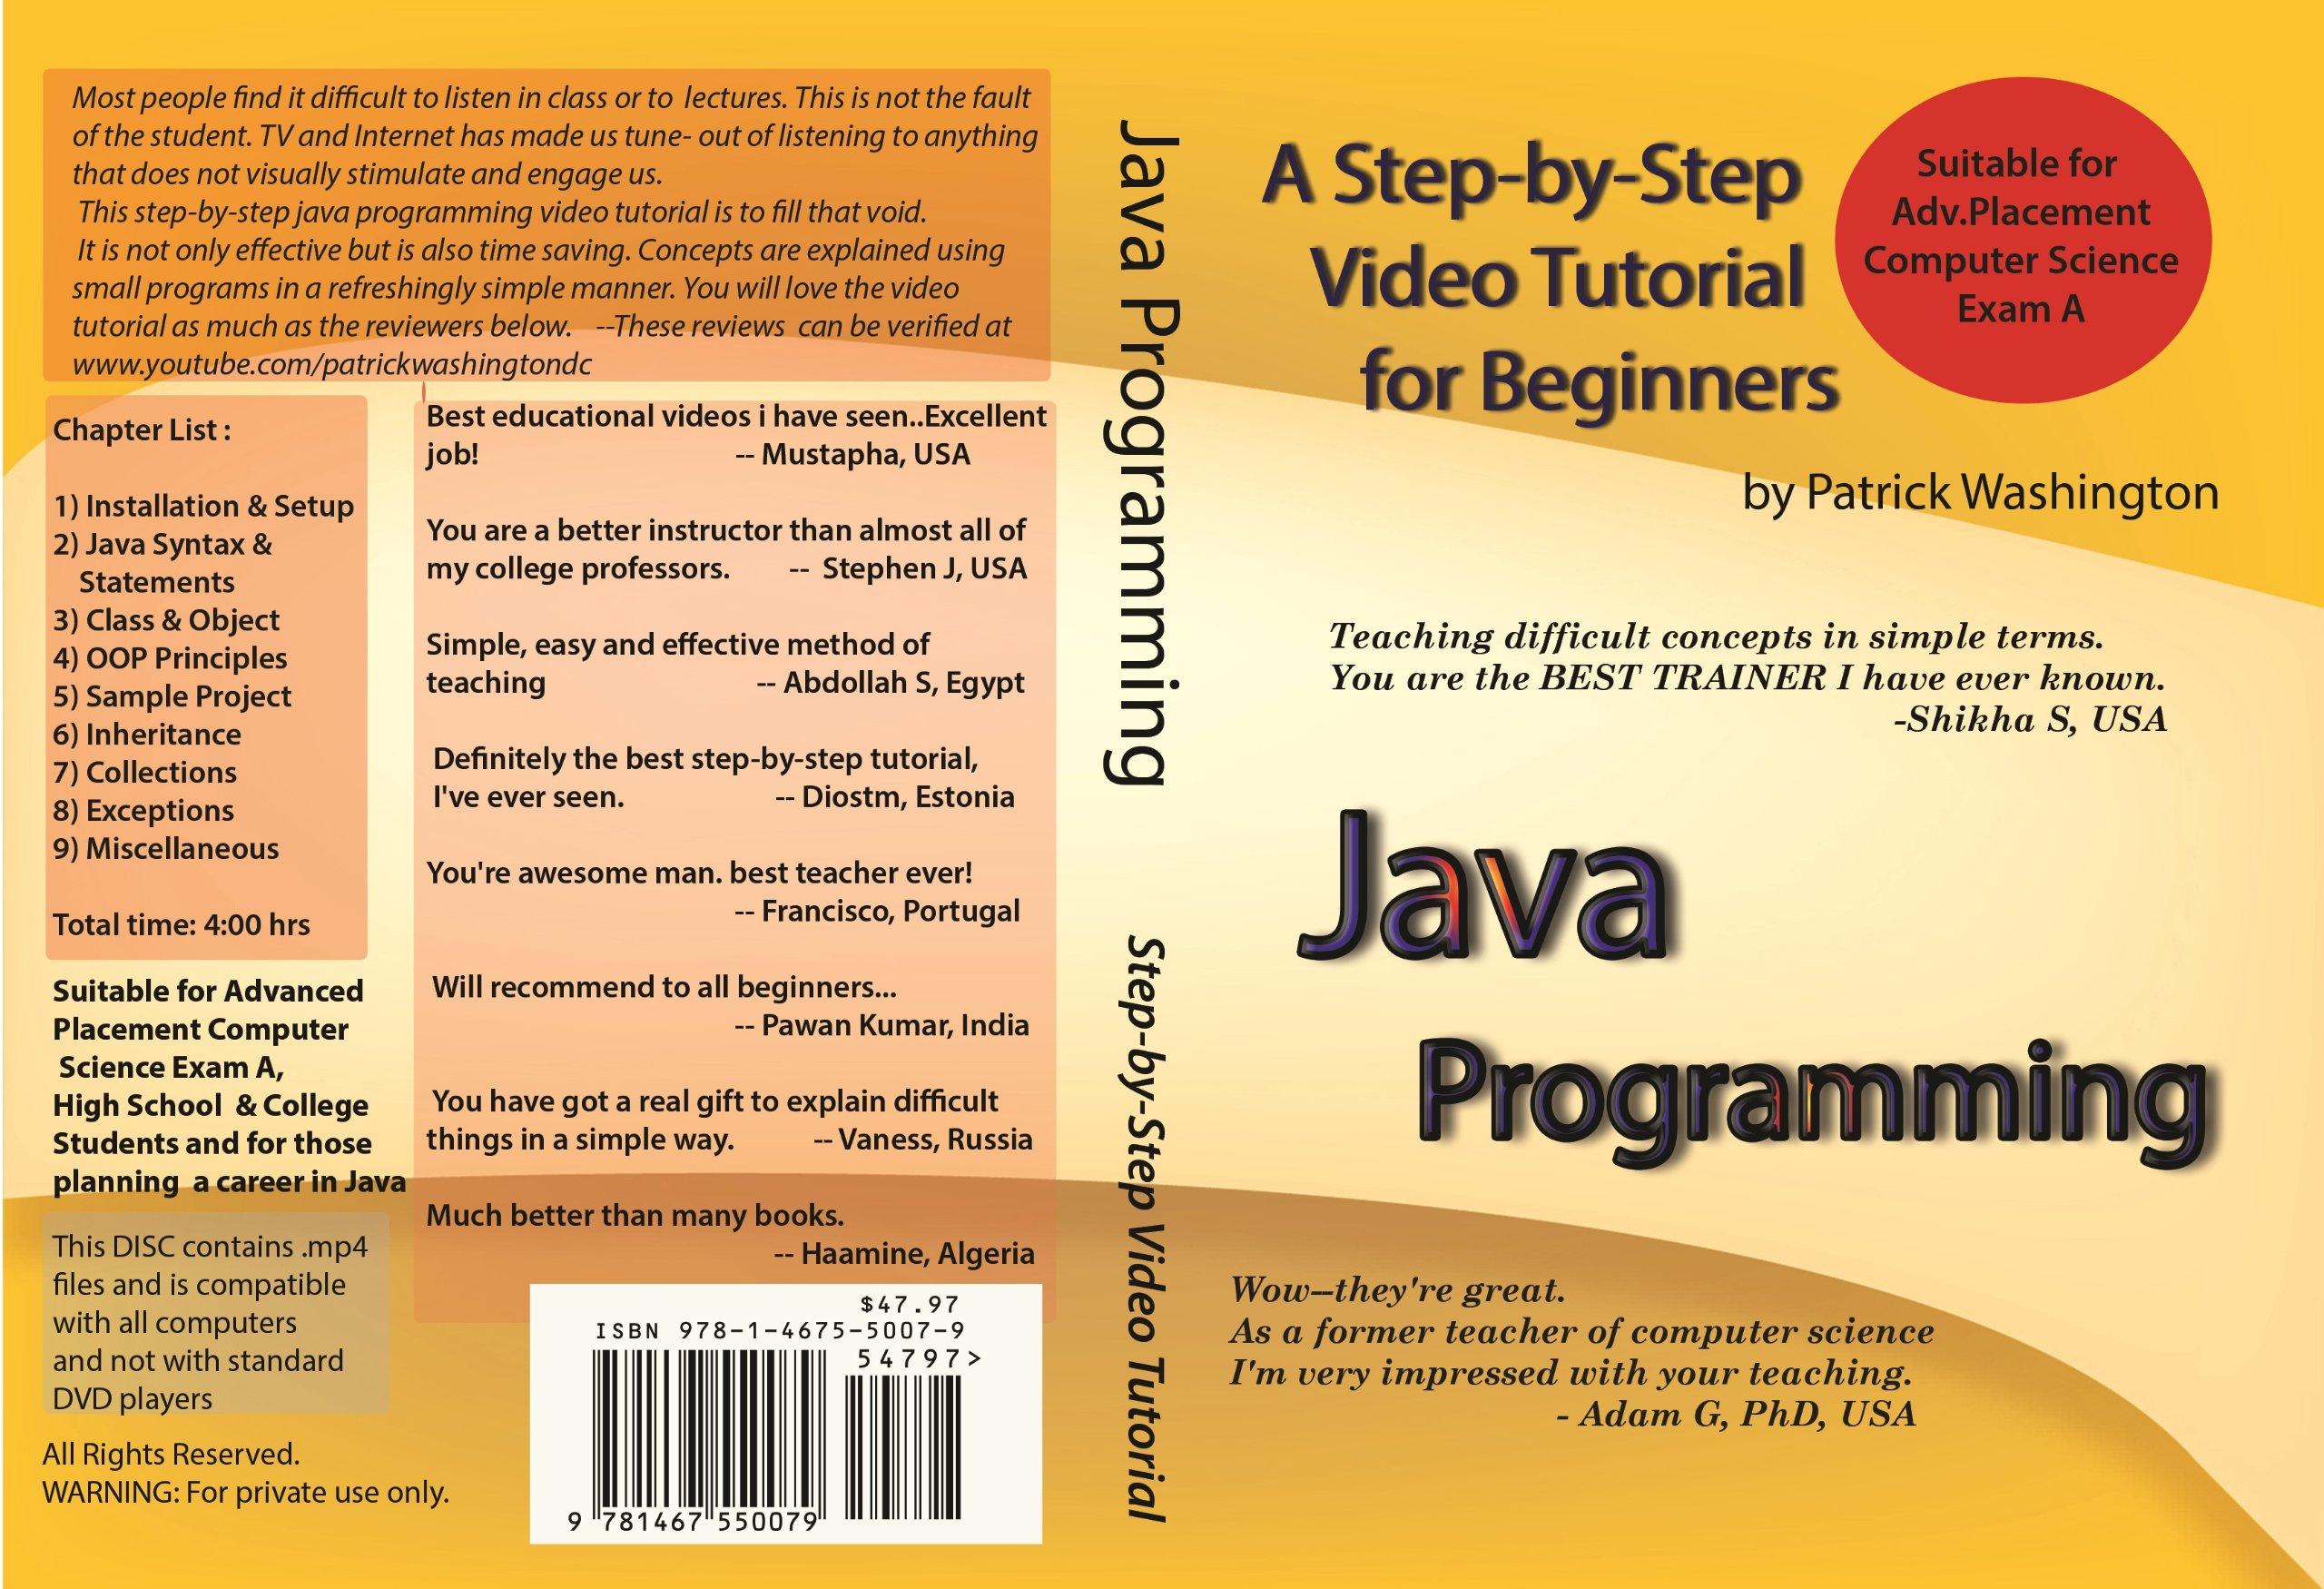 Java programming step by step video tutorial for beginners java programming step by step video tutorial for beginners patrick washington 9781467550079 amazon books baditri Gallery